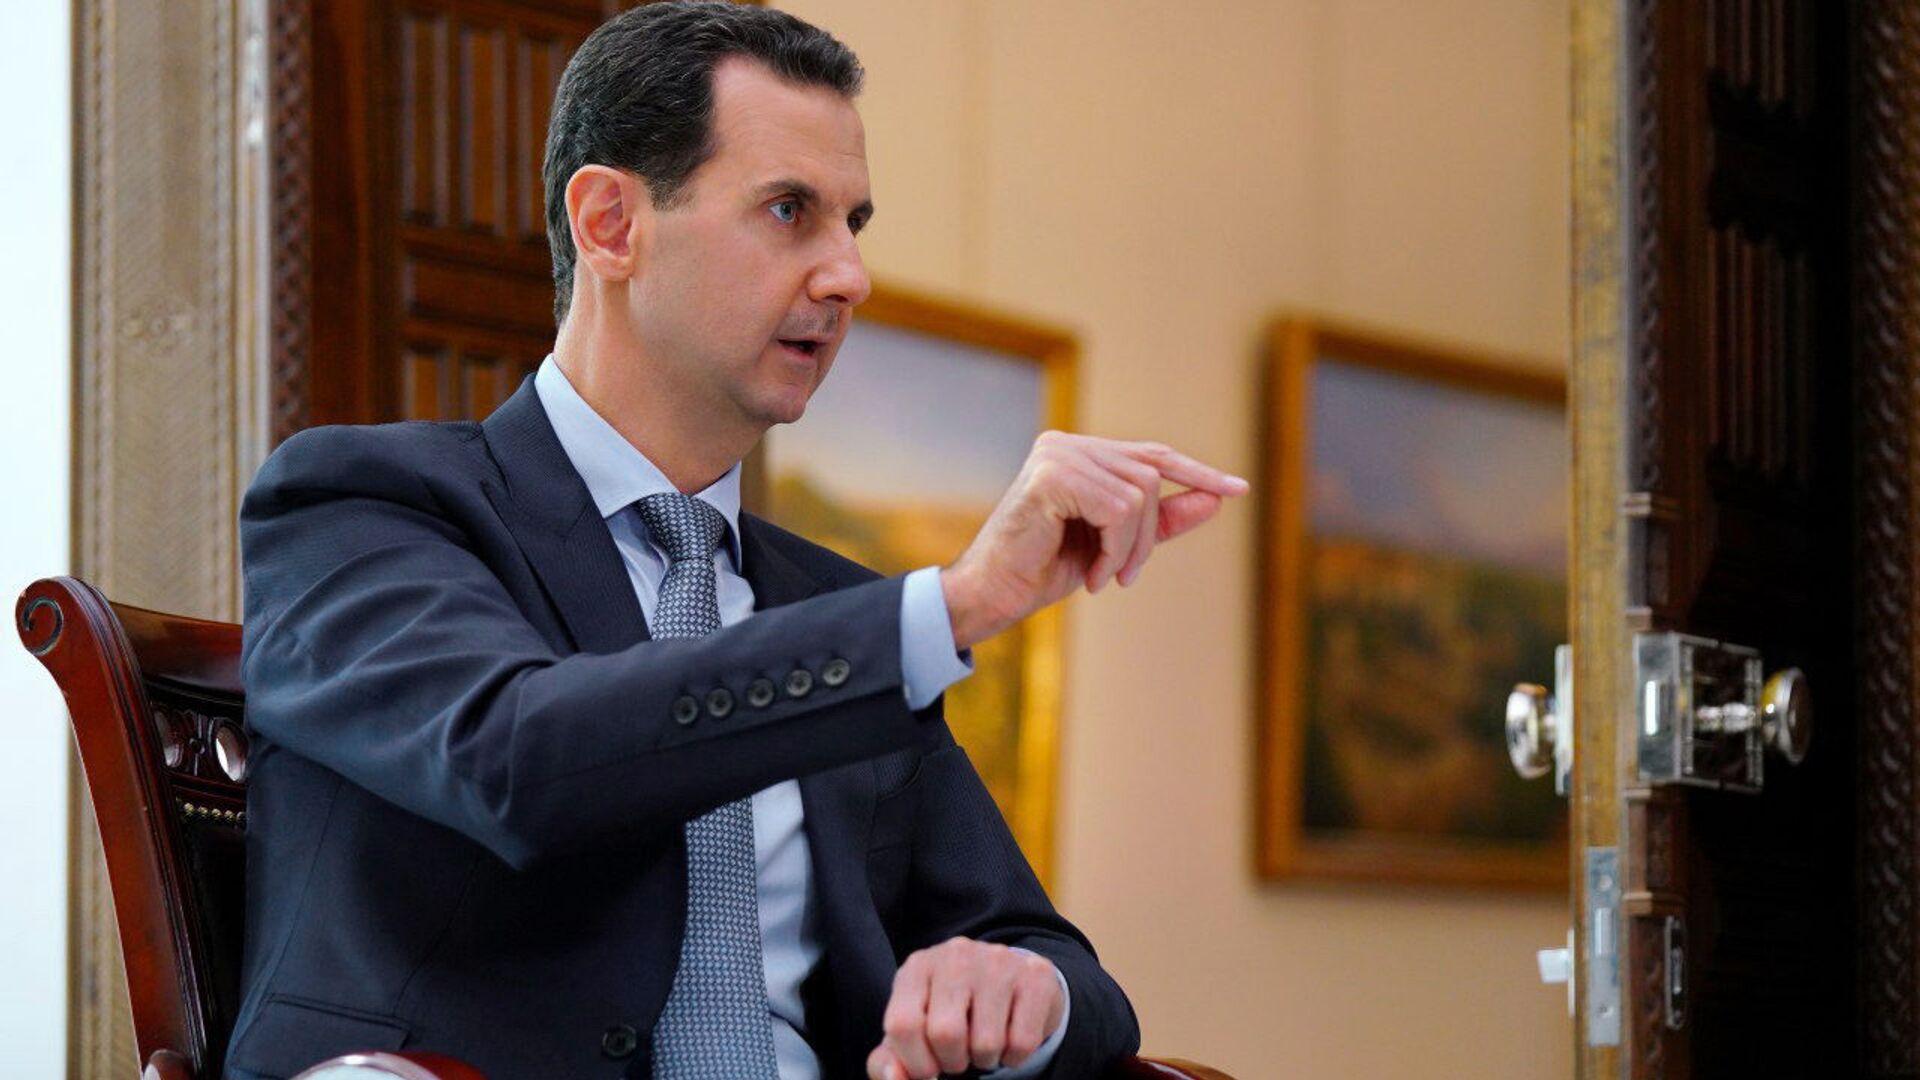 Il presidente siriano Basah al-Assad - Sputnik Italia, 1920, 03.06.2021